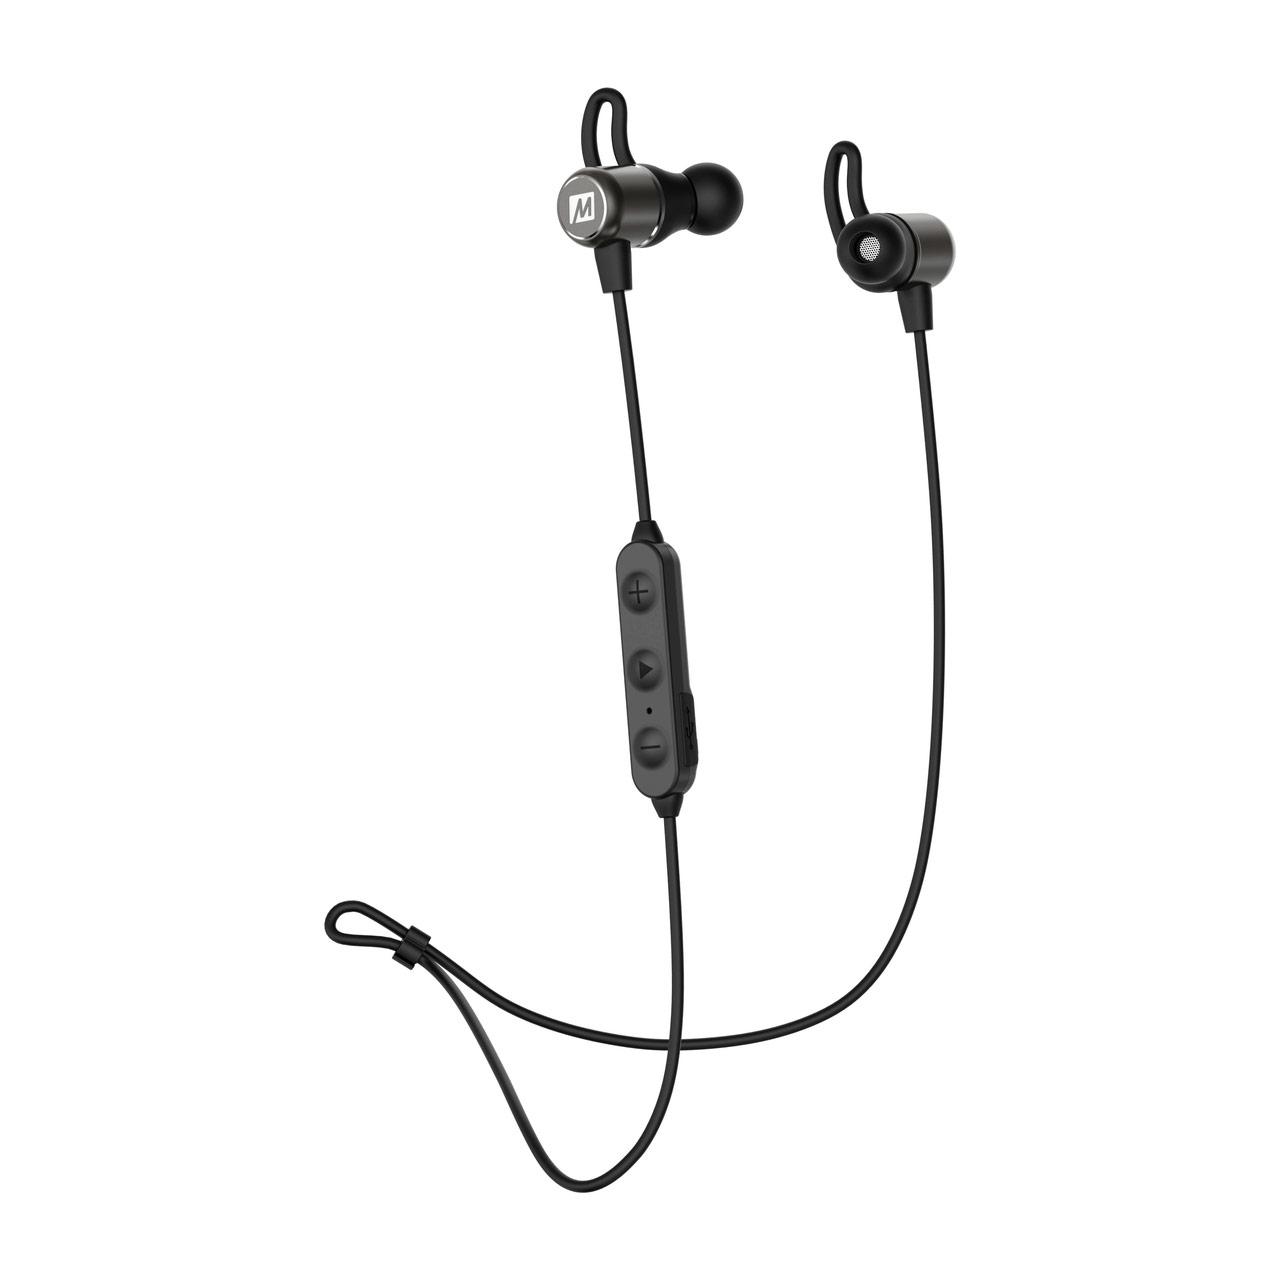 Ear Boost Bluetooth Wireless Adaptive Audio Enhancement Earphones